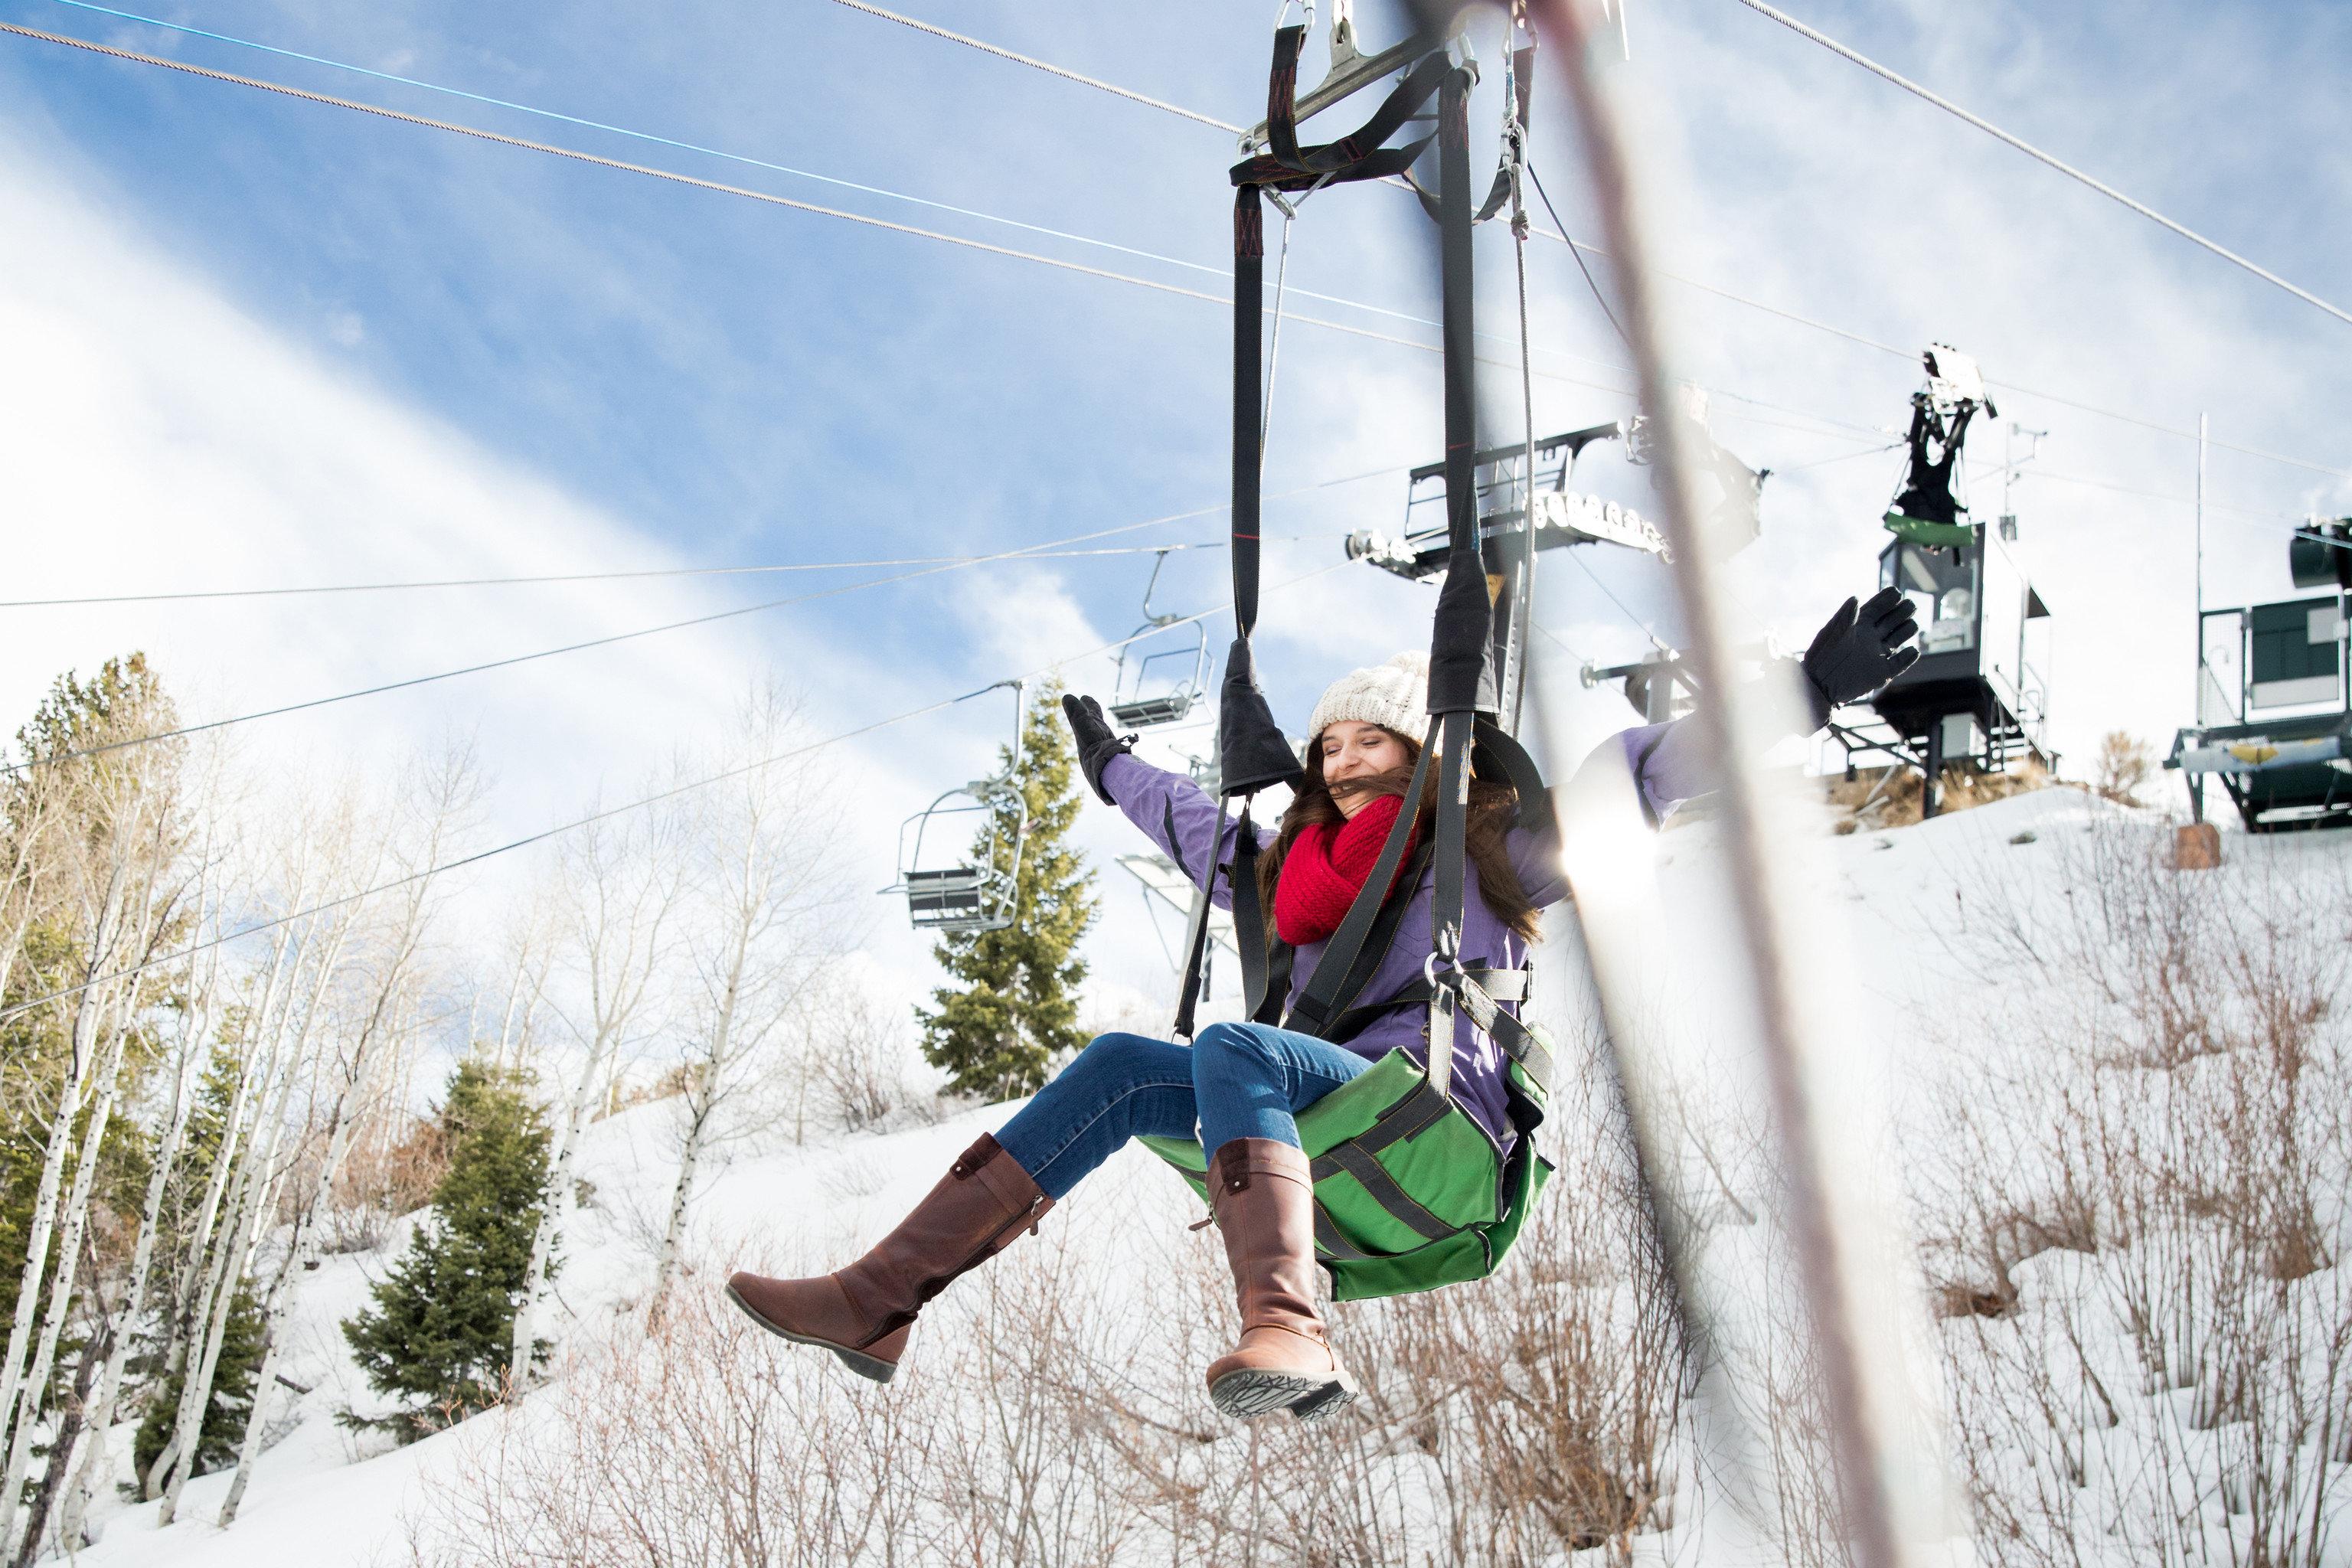 Trip Ideas outdoor sky snow Winter weather Ski ski equipment ski tow sports extreme sport jumping winter sport mast wind slope